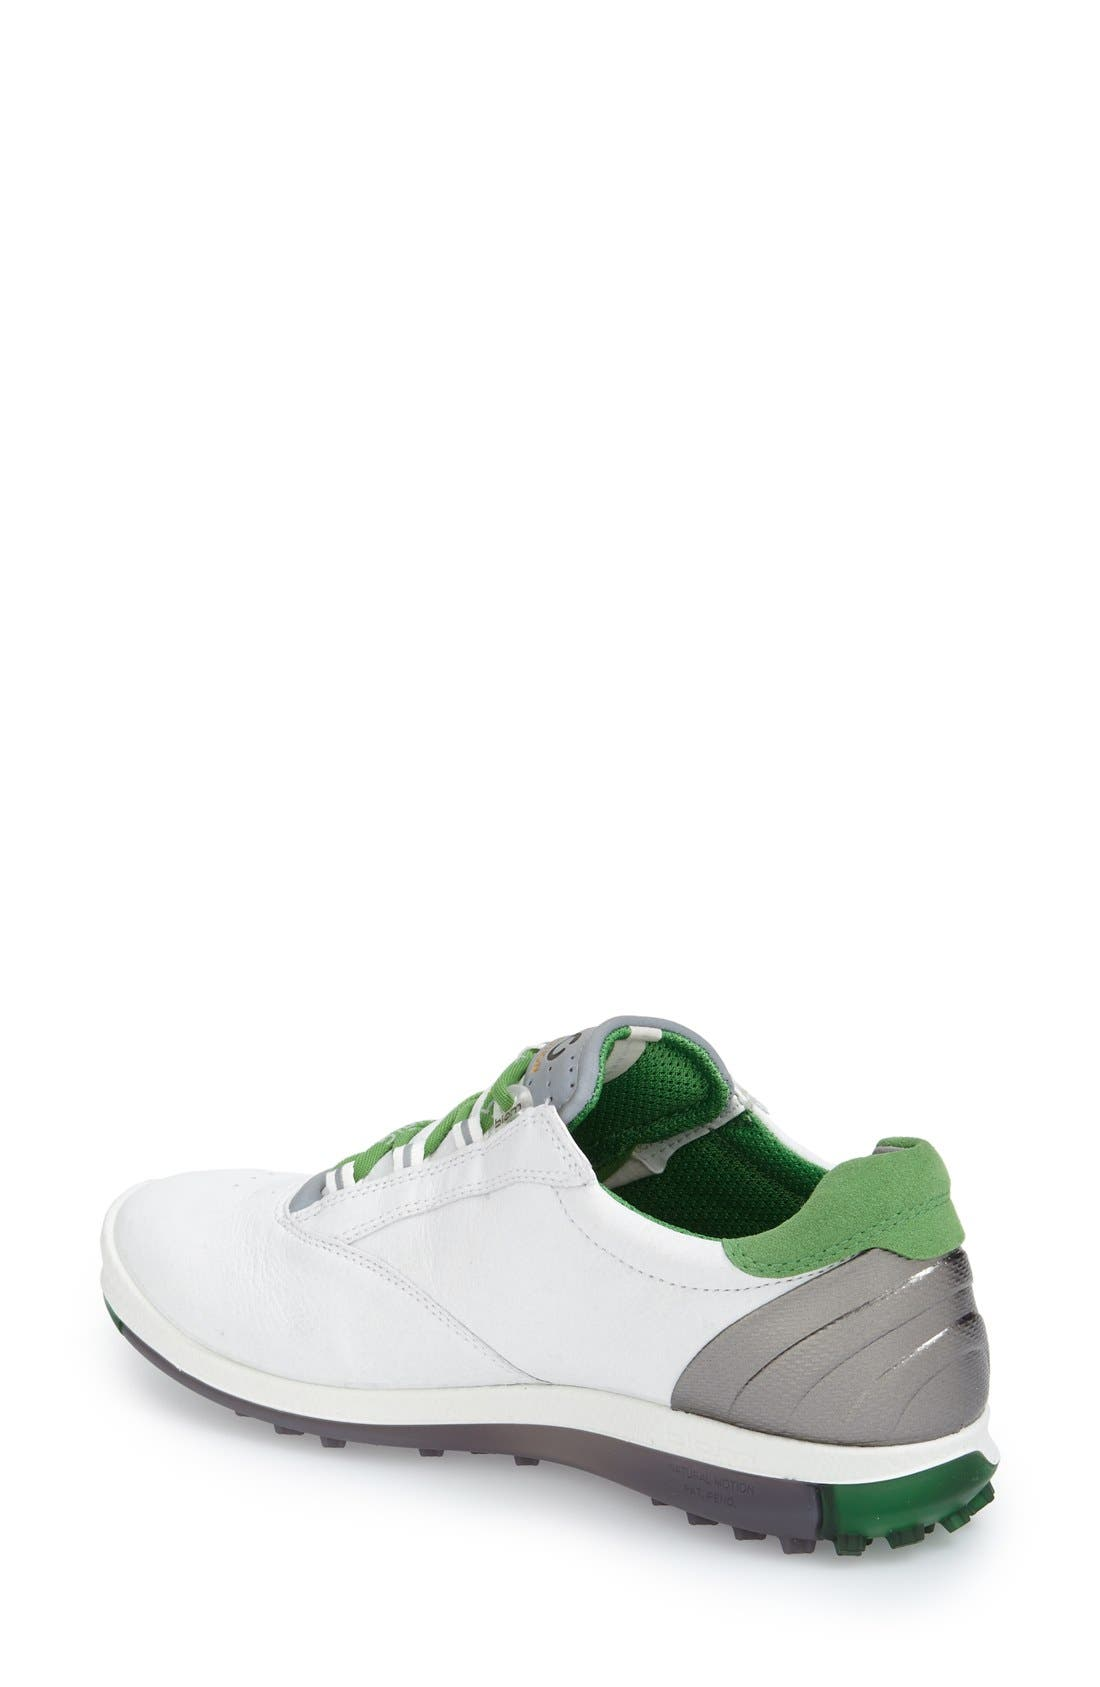 'BIOM' Hydromax<sup>®</sup> Waterproof Golf Shoe,                             Alternate thumbnail 12, color,